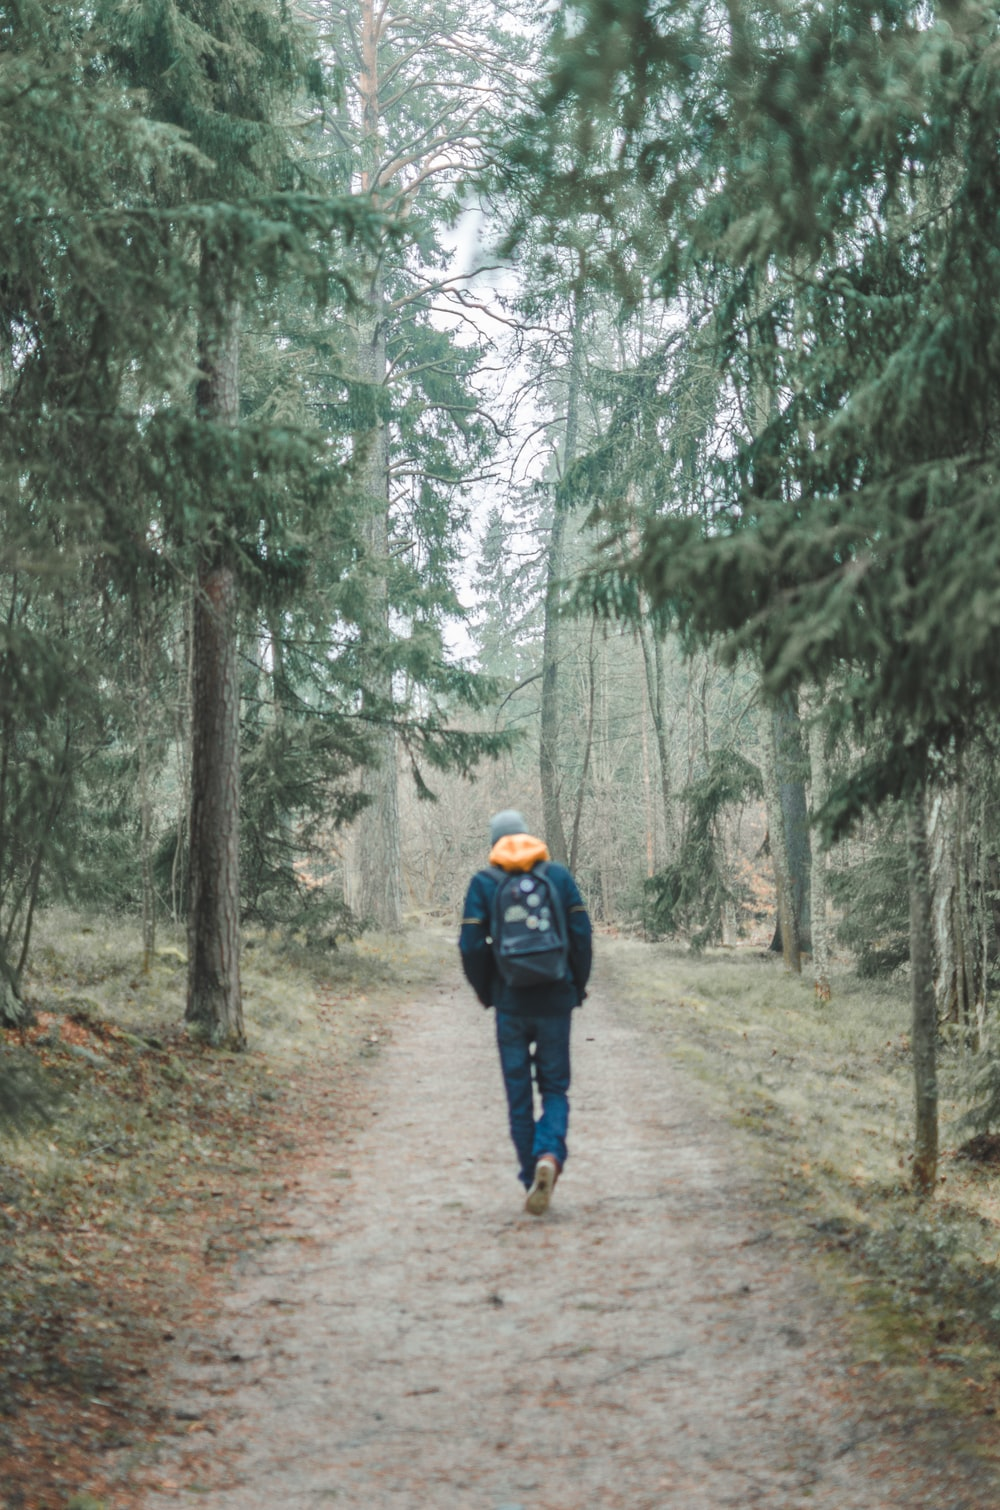 man waking narrow pathway near trees at daytime